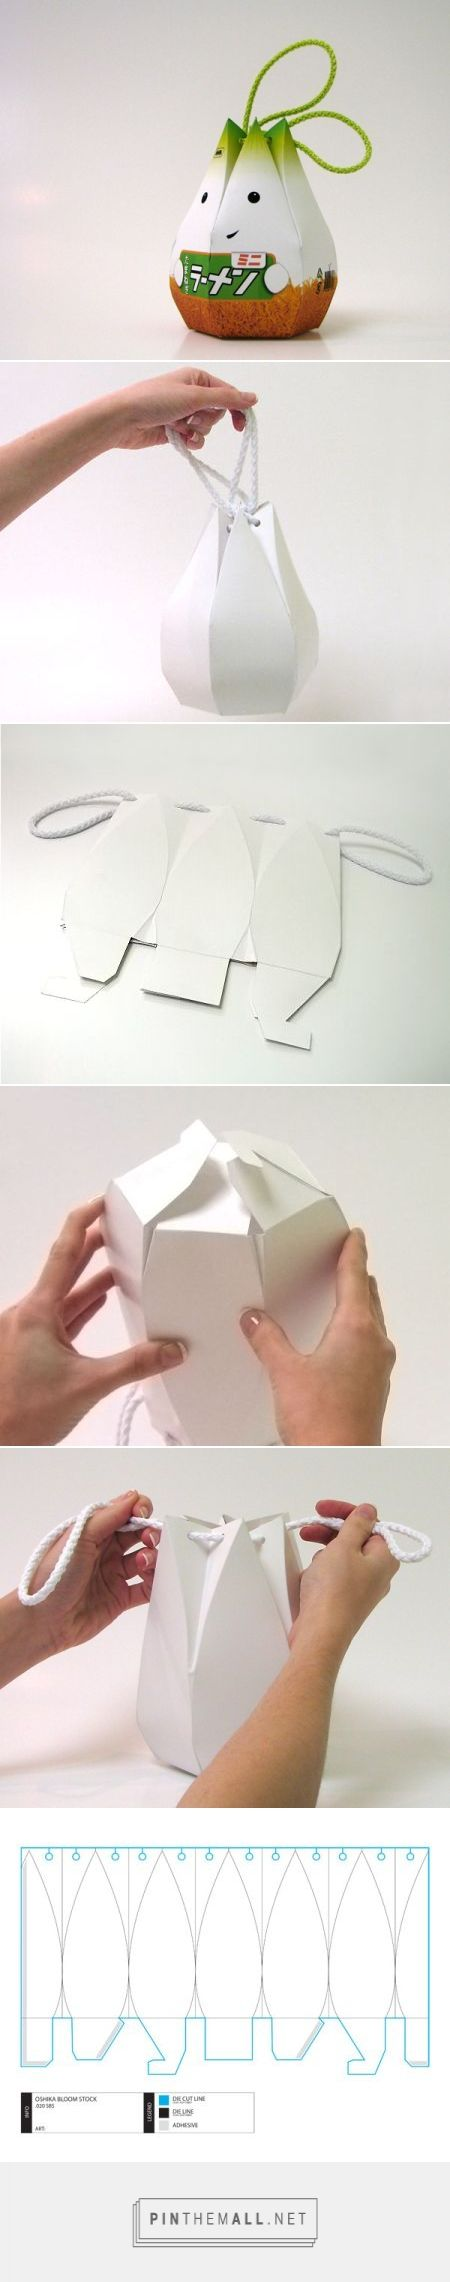 creative oshika packaging on i new idea homepage ever wonder how